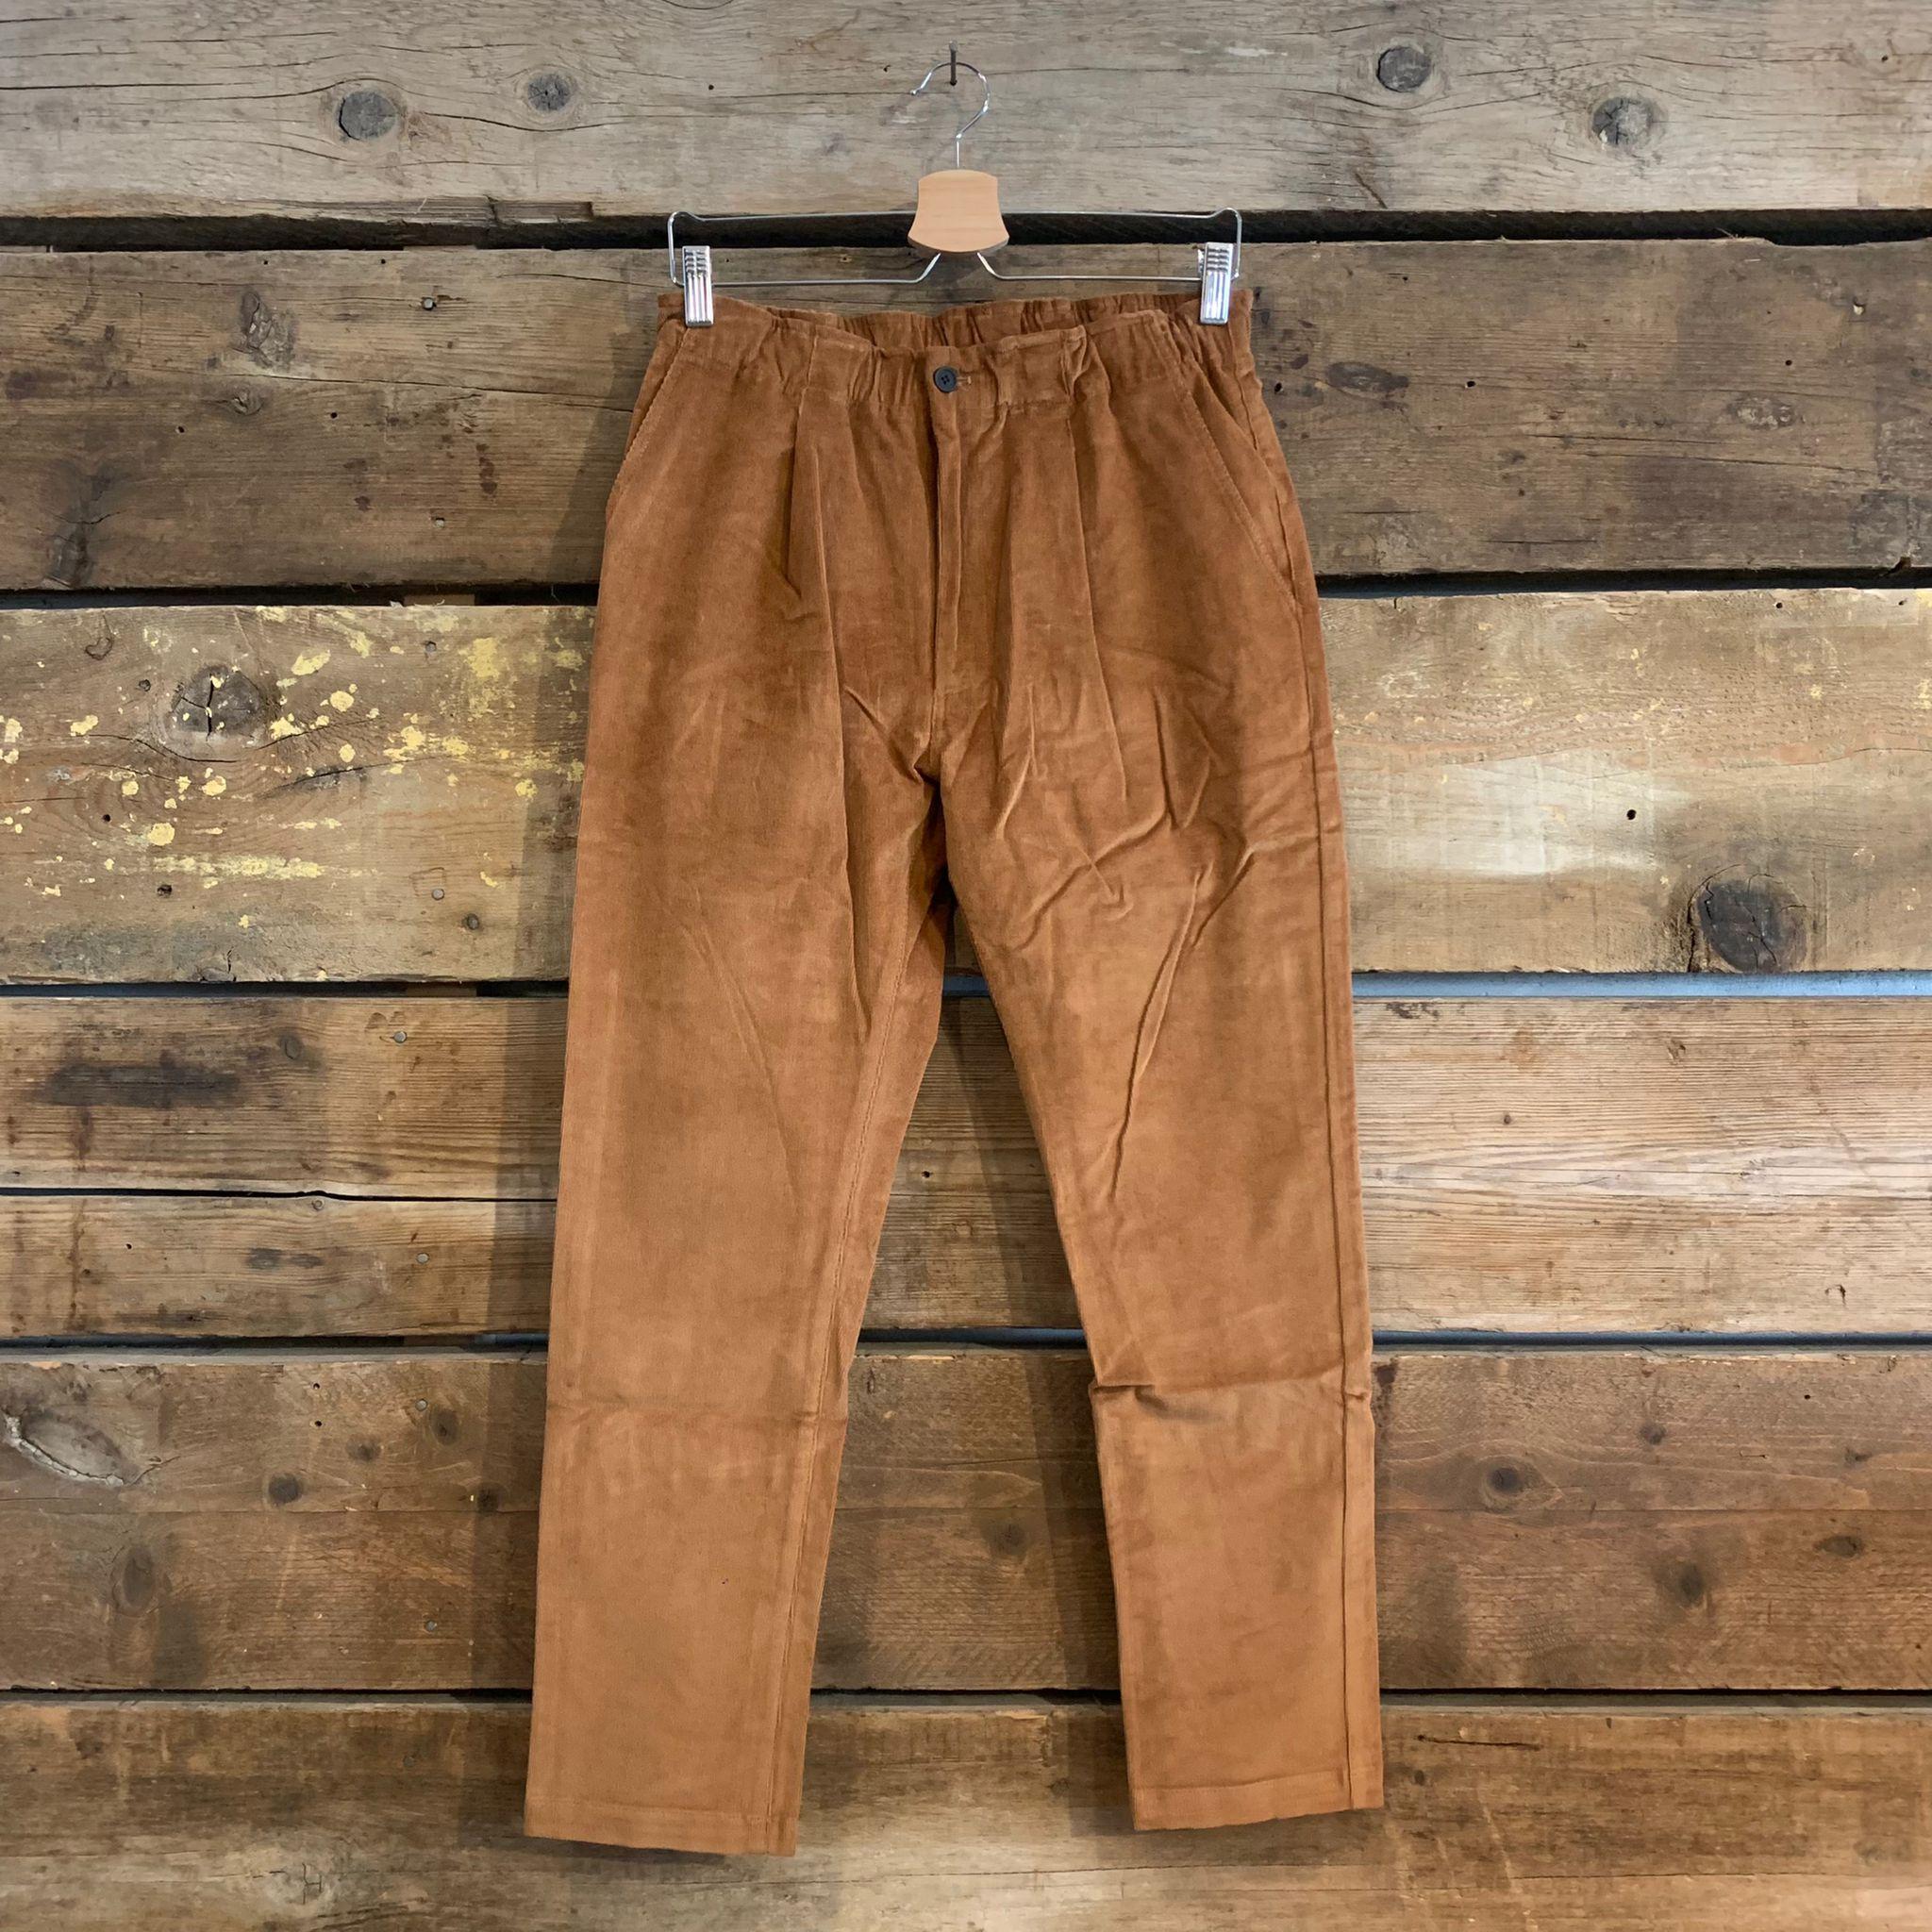 Pantalone Bakery Supplies Lowan Corduroy in Velluto Tabacco